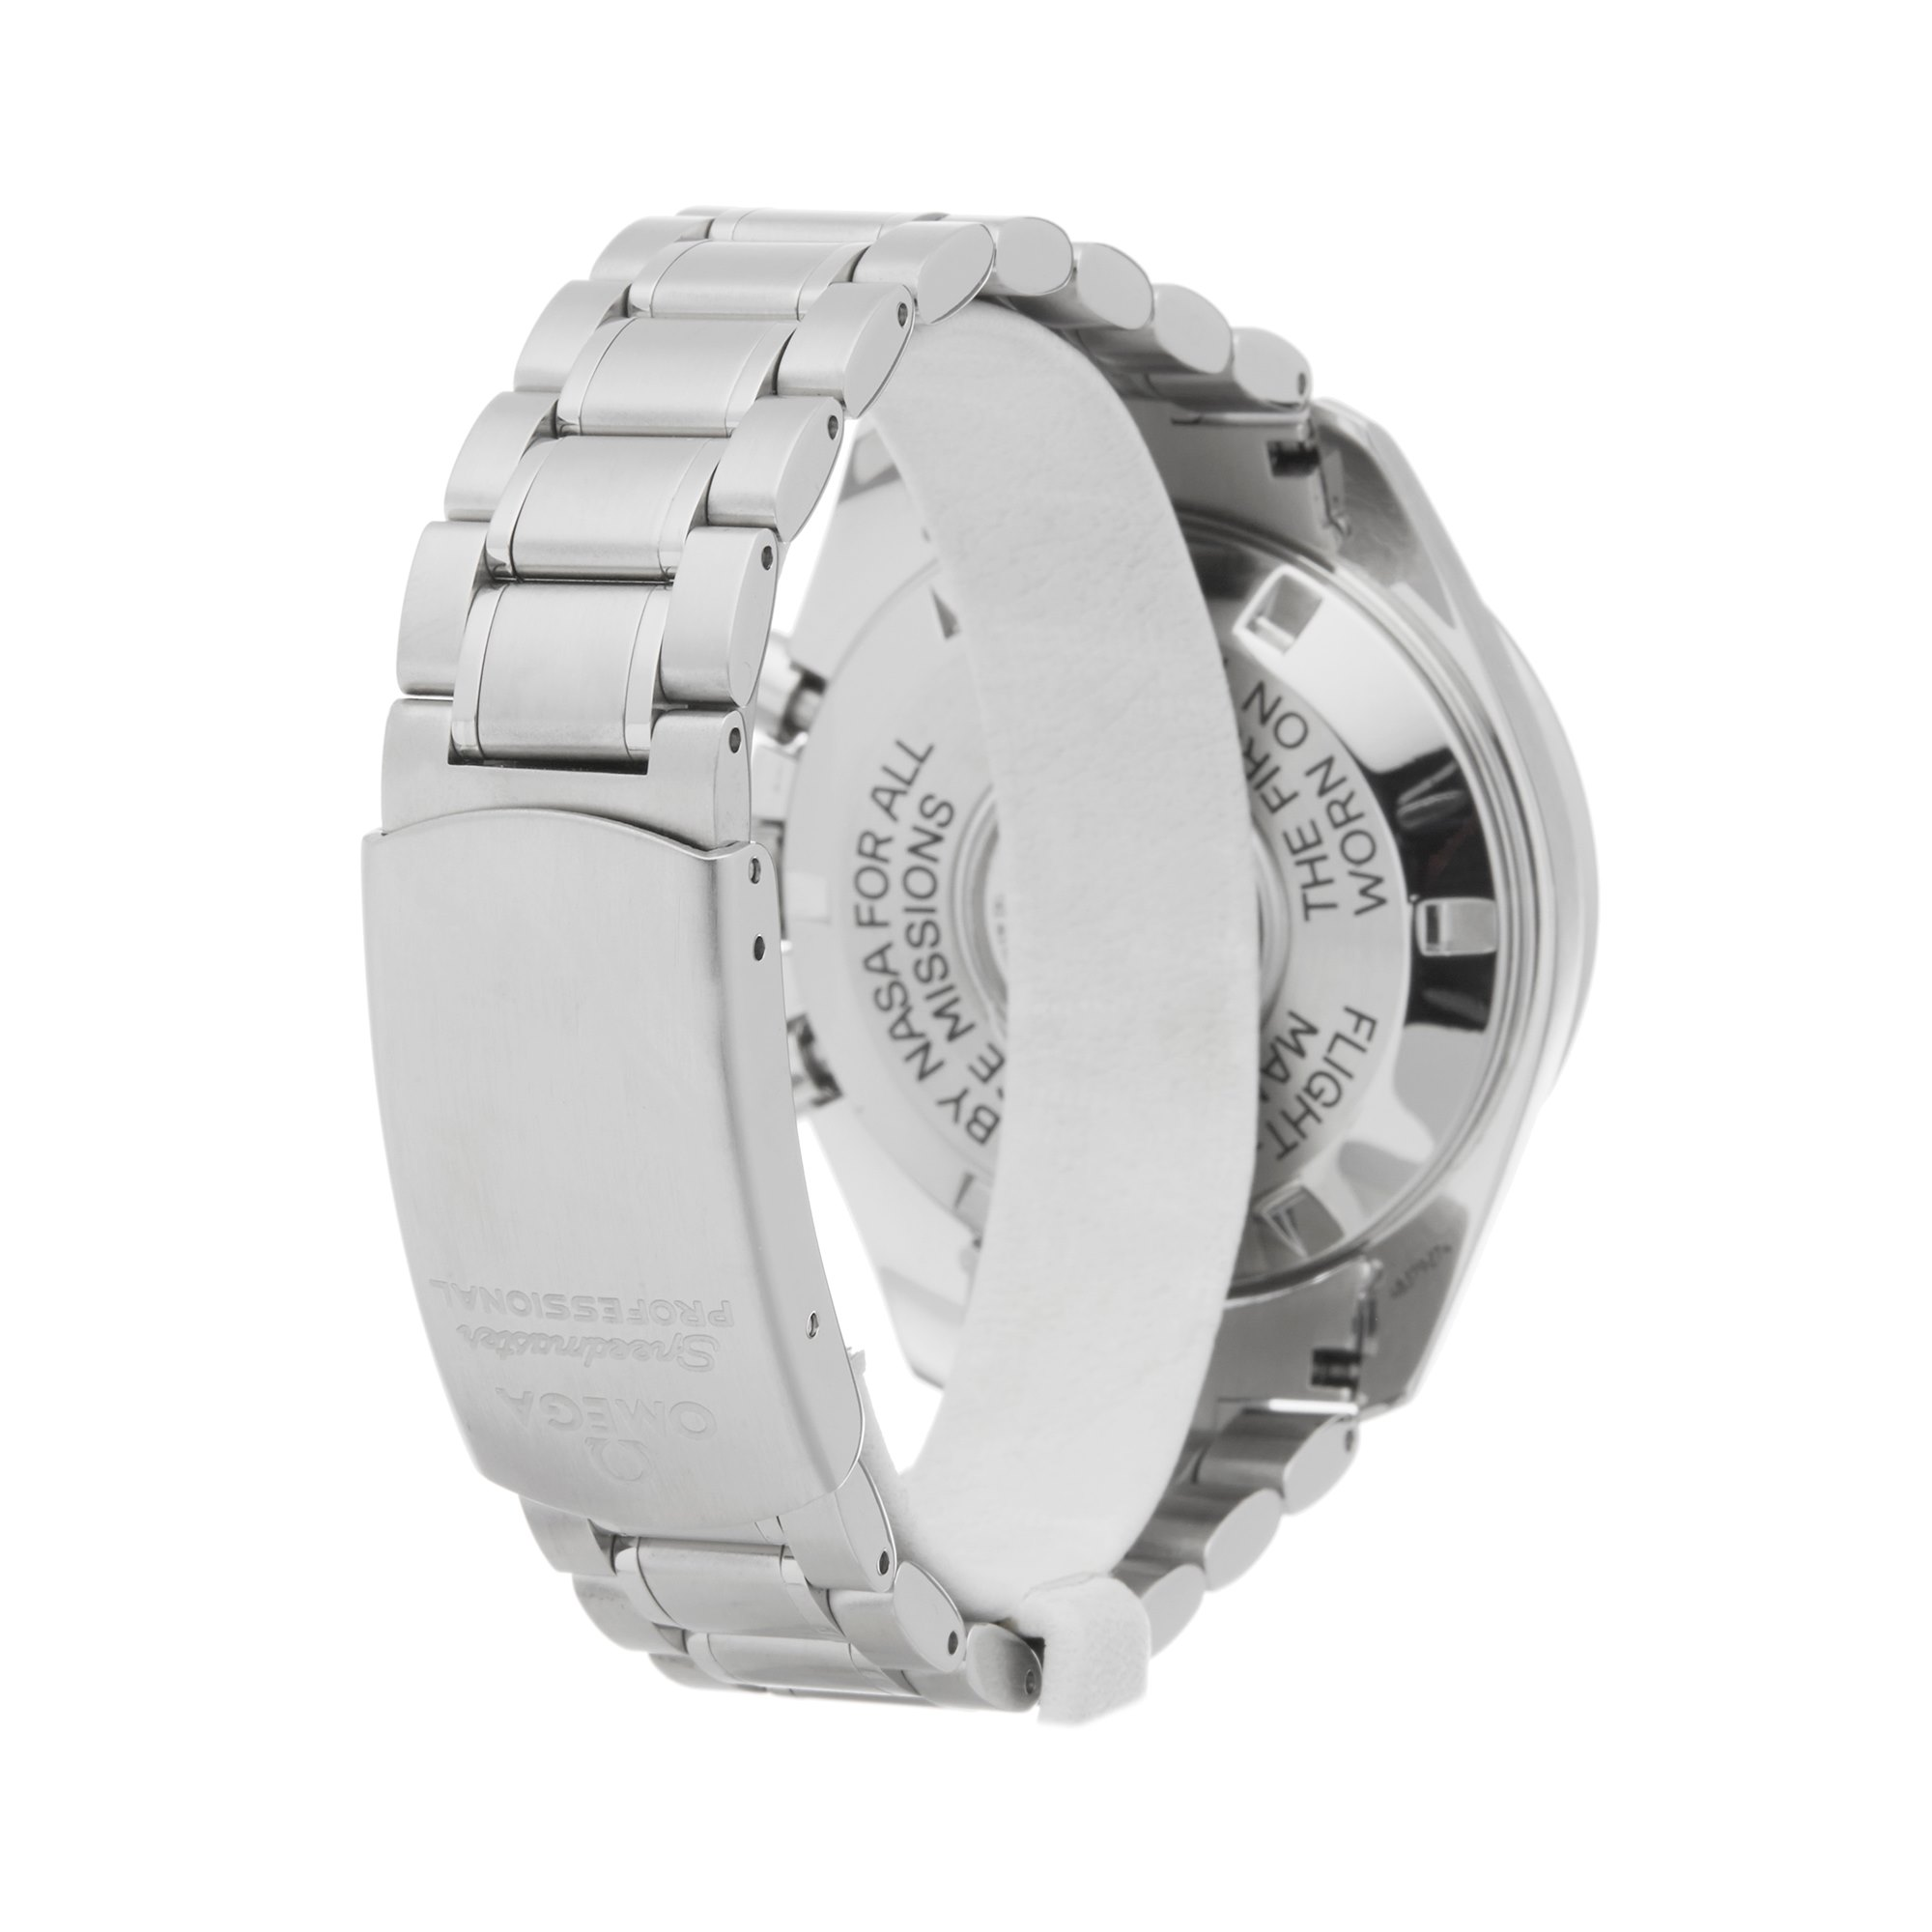 Omega Speedmaster Missions Gemini VII Chronograph Roestvrij Staal 145.0022 35970500